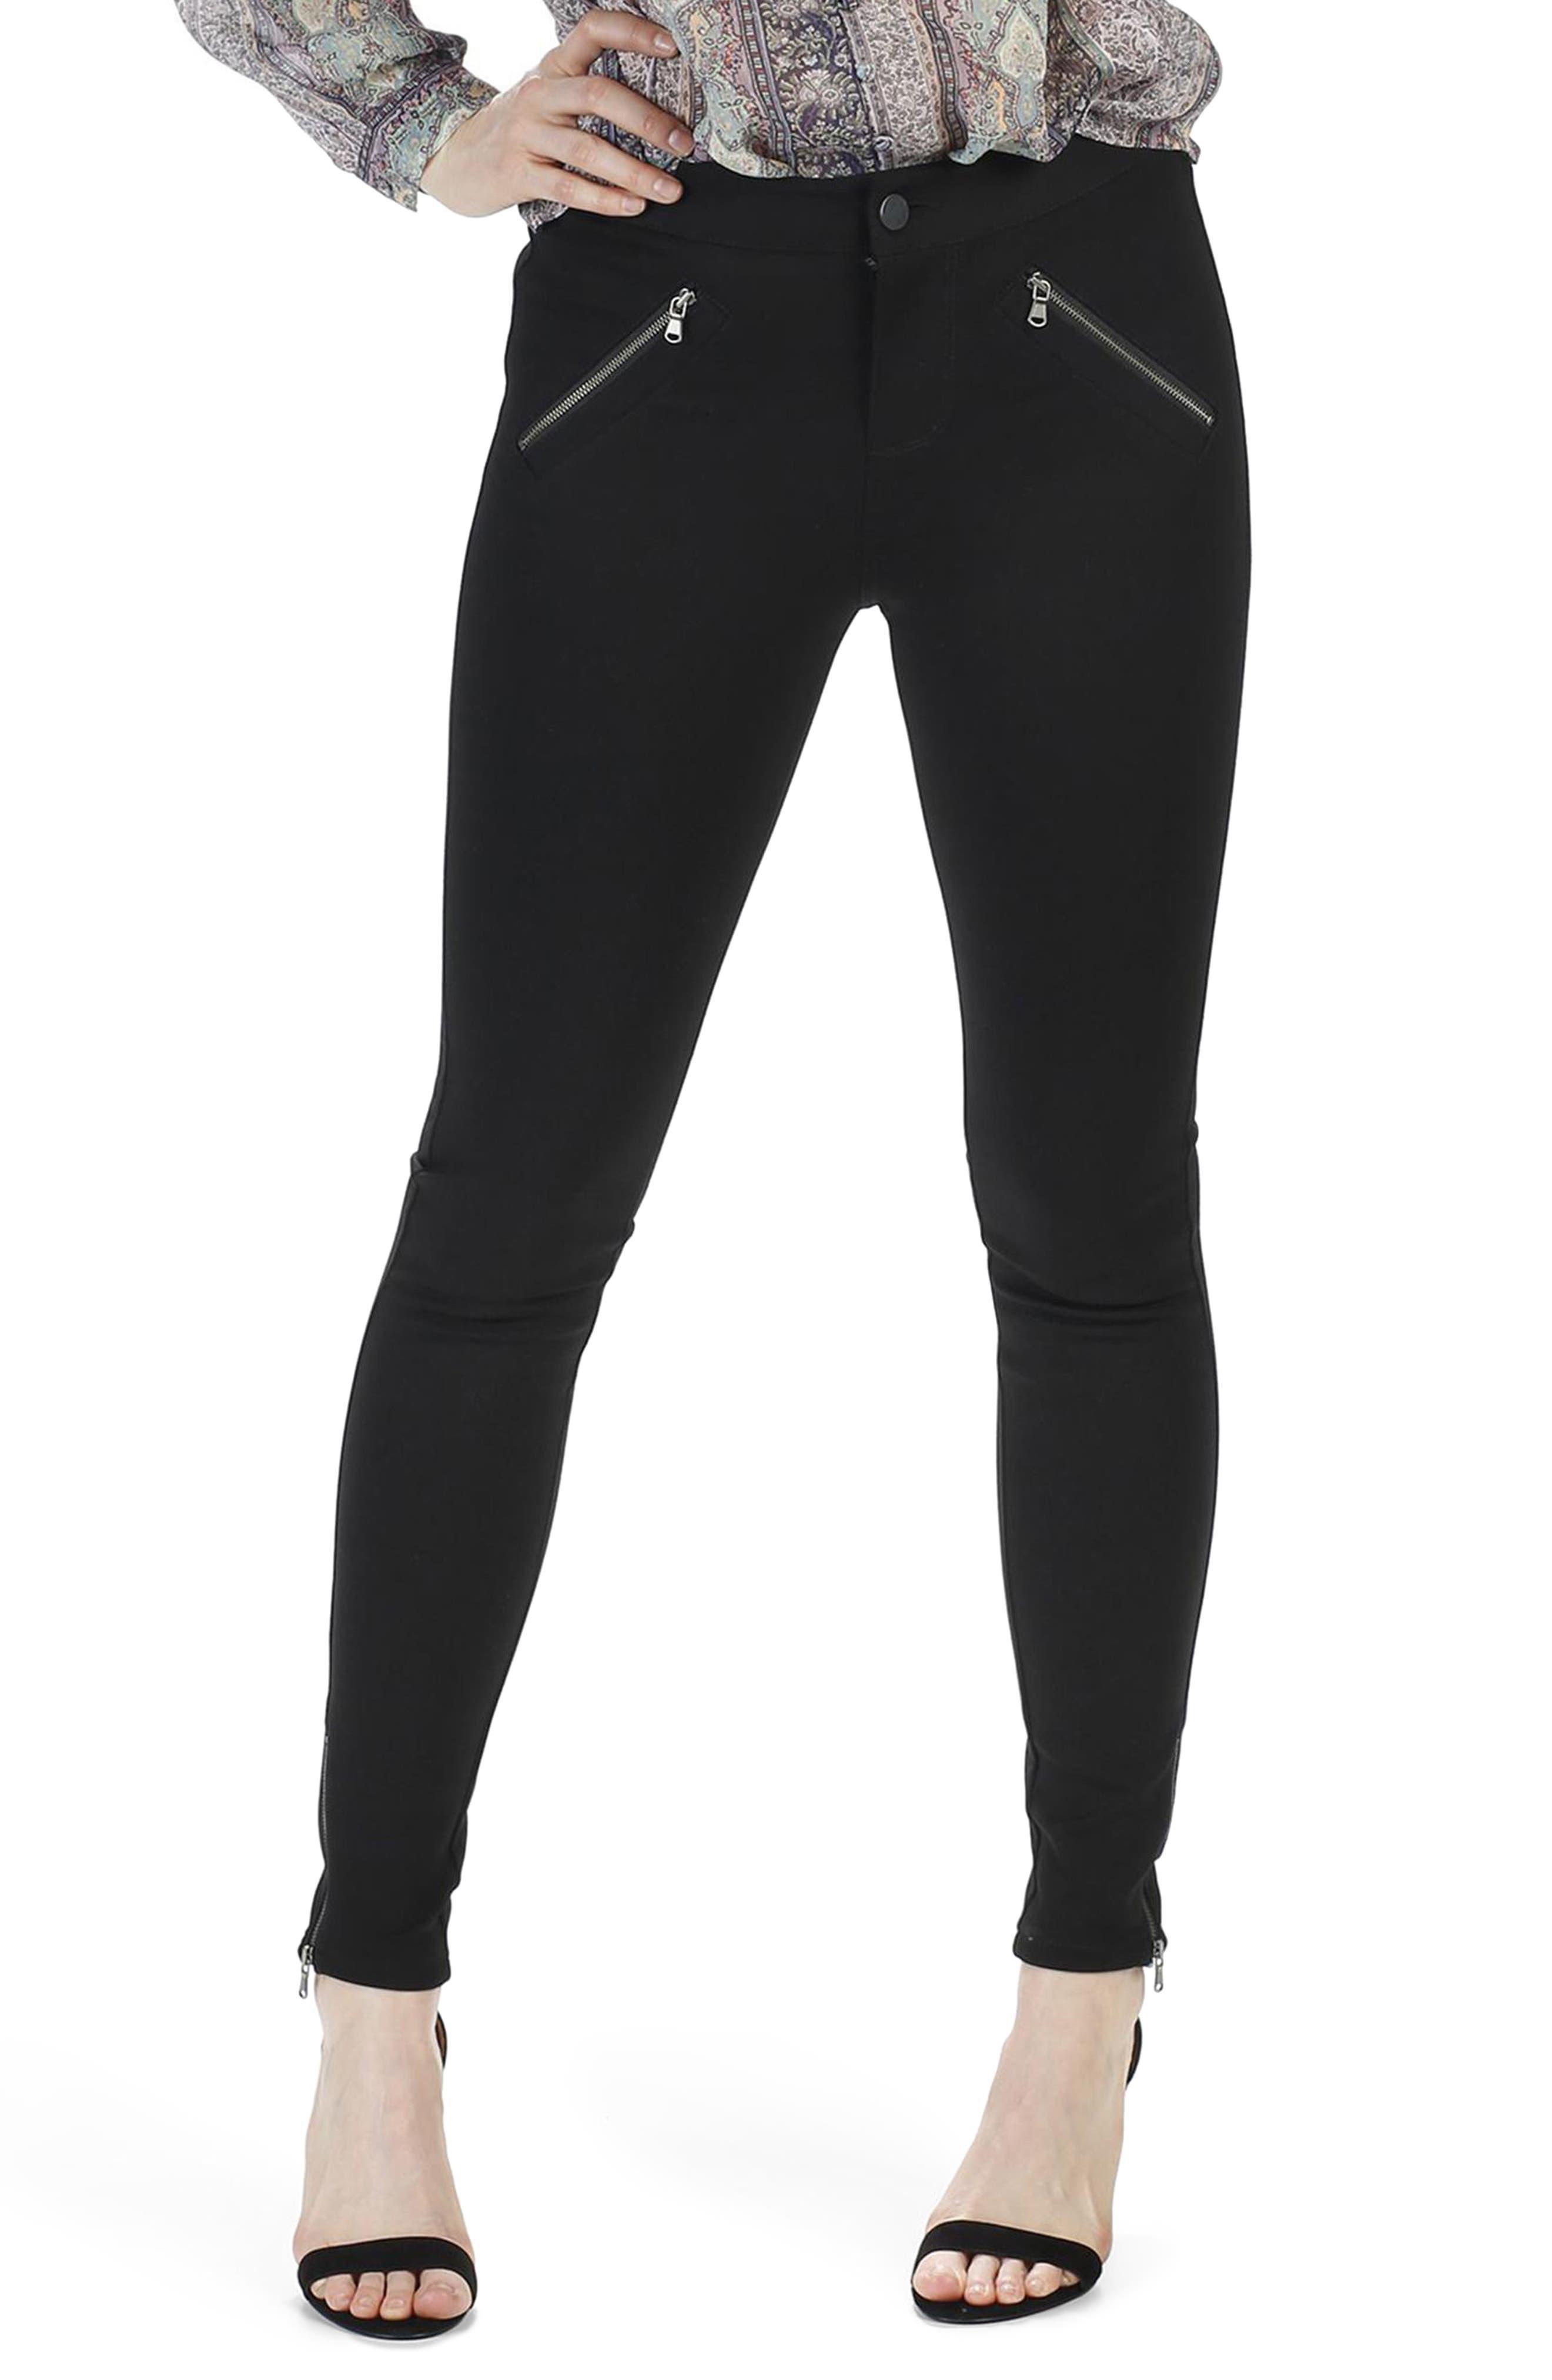 Simmons Ankle Skinny Ponte Pants,                         Main,                         color, Black